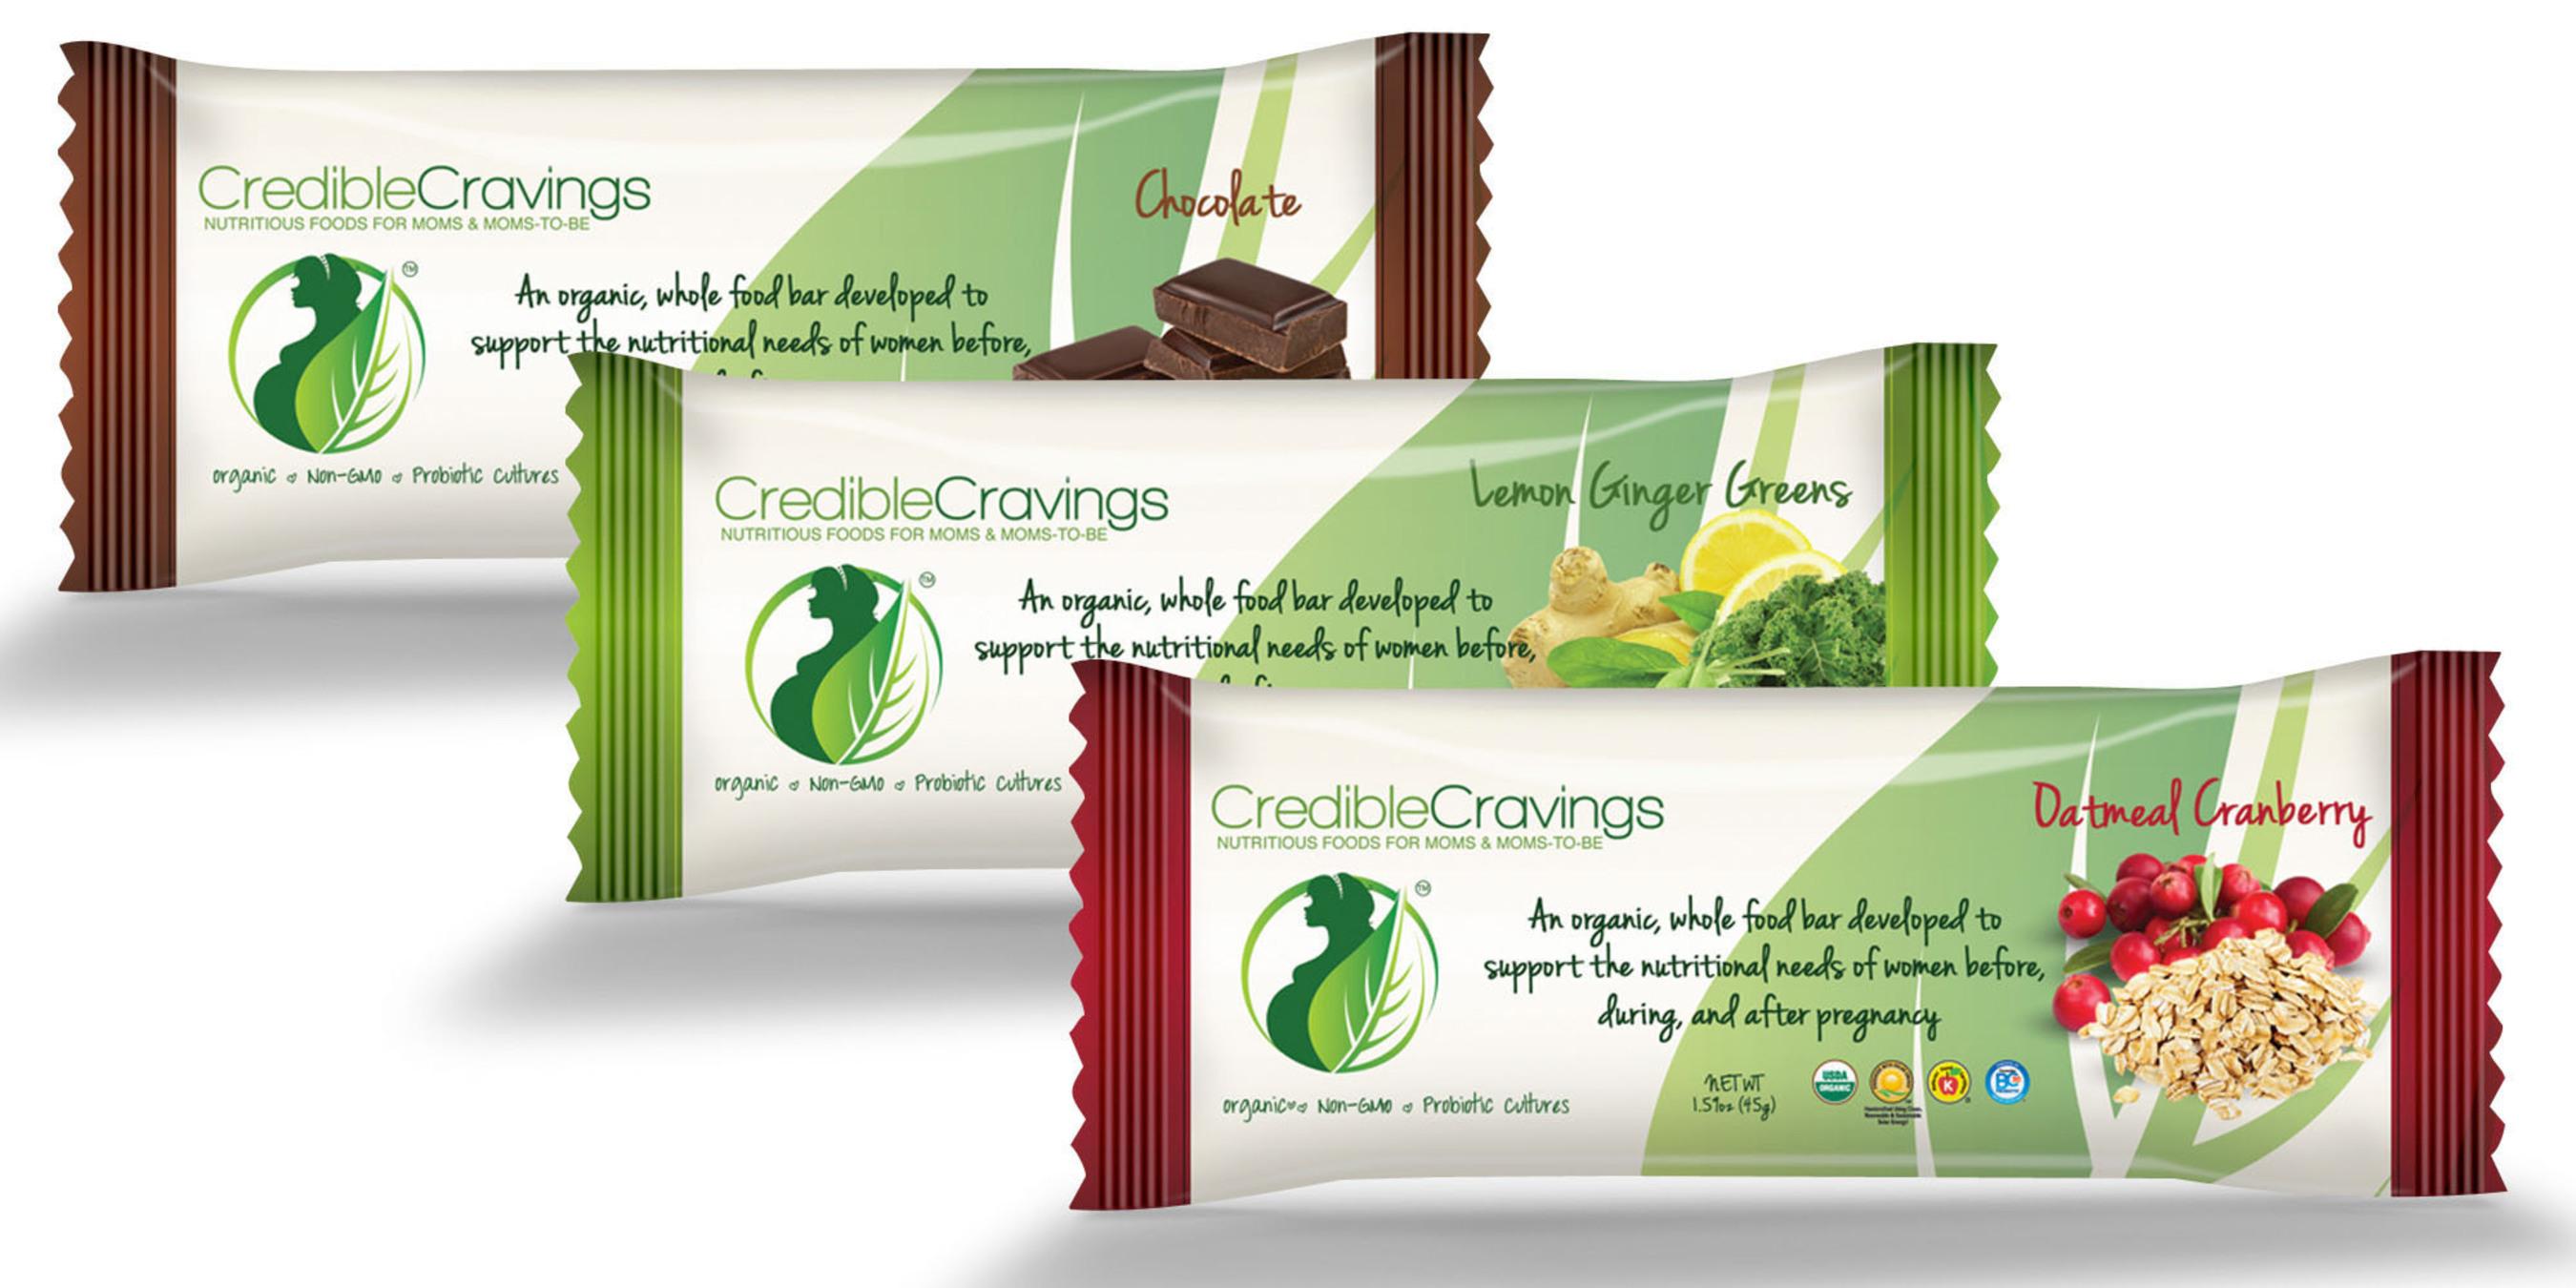 CredibleCravings debuts its bars in three flavor varieties: Oatmeal Cranberry, Chocolate, Lemon Ginger Greens.   (PRNewsFoto/CredibleCravings)